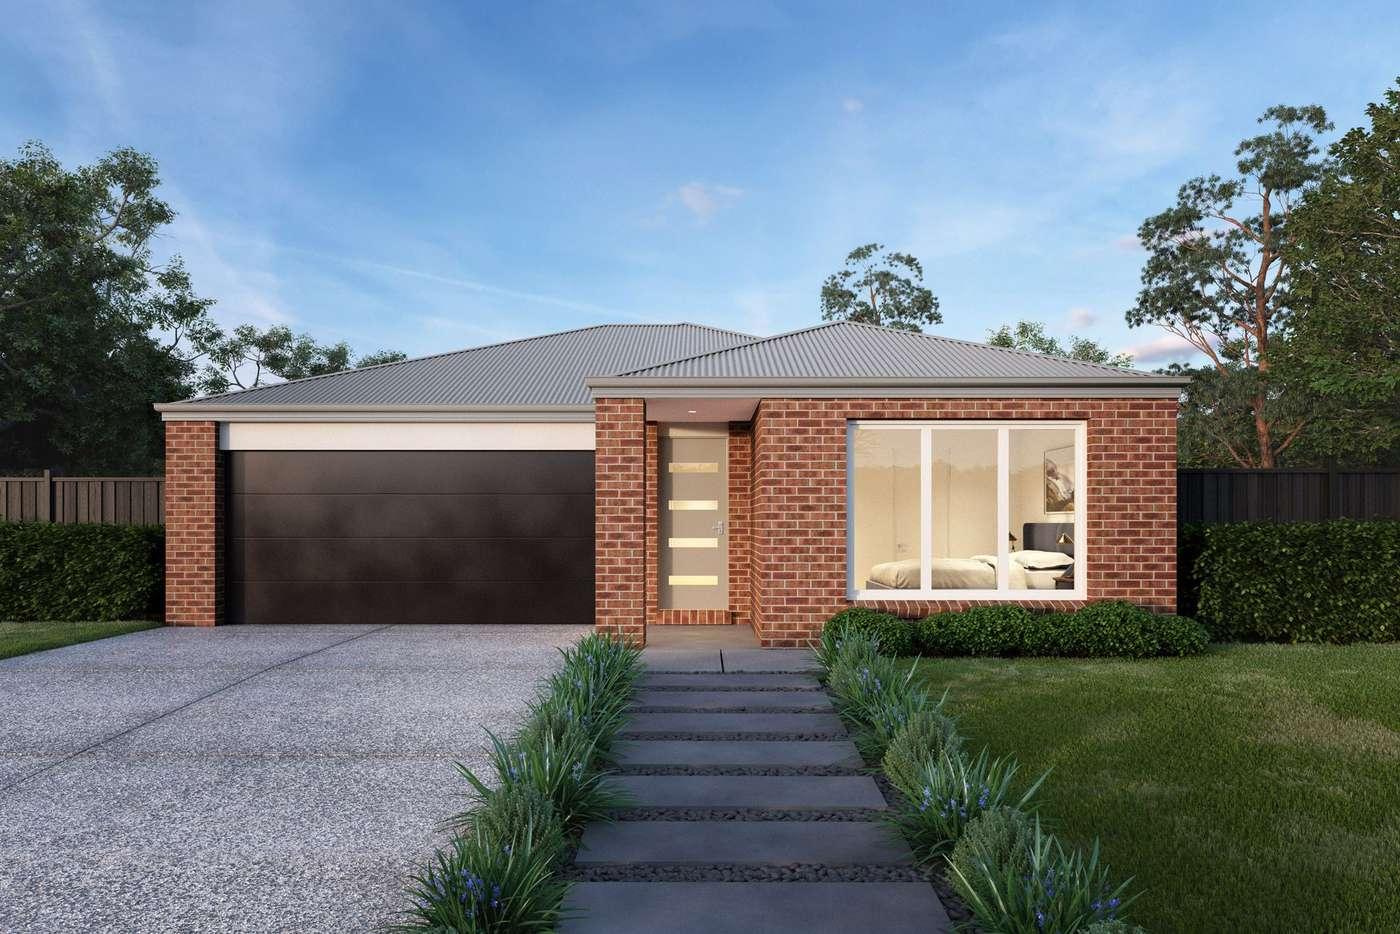 Main view of Homely house listing, 1/421 Walnut Avenue, Mildura VIC 3500